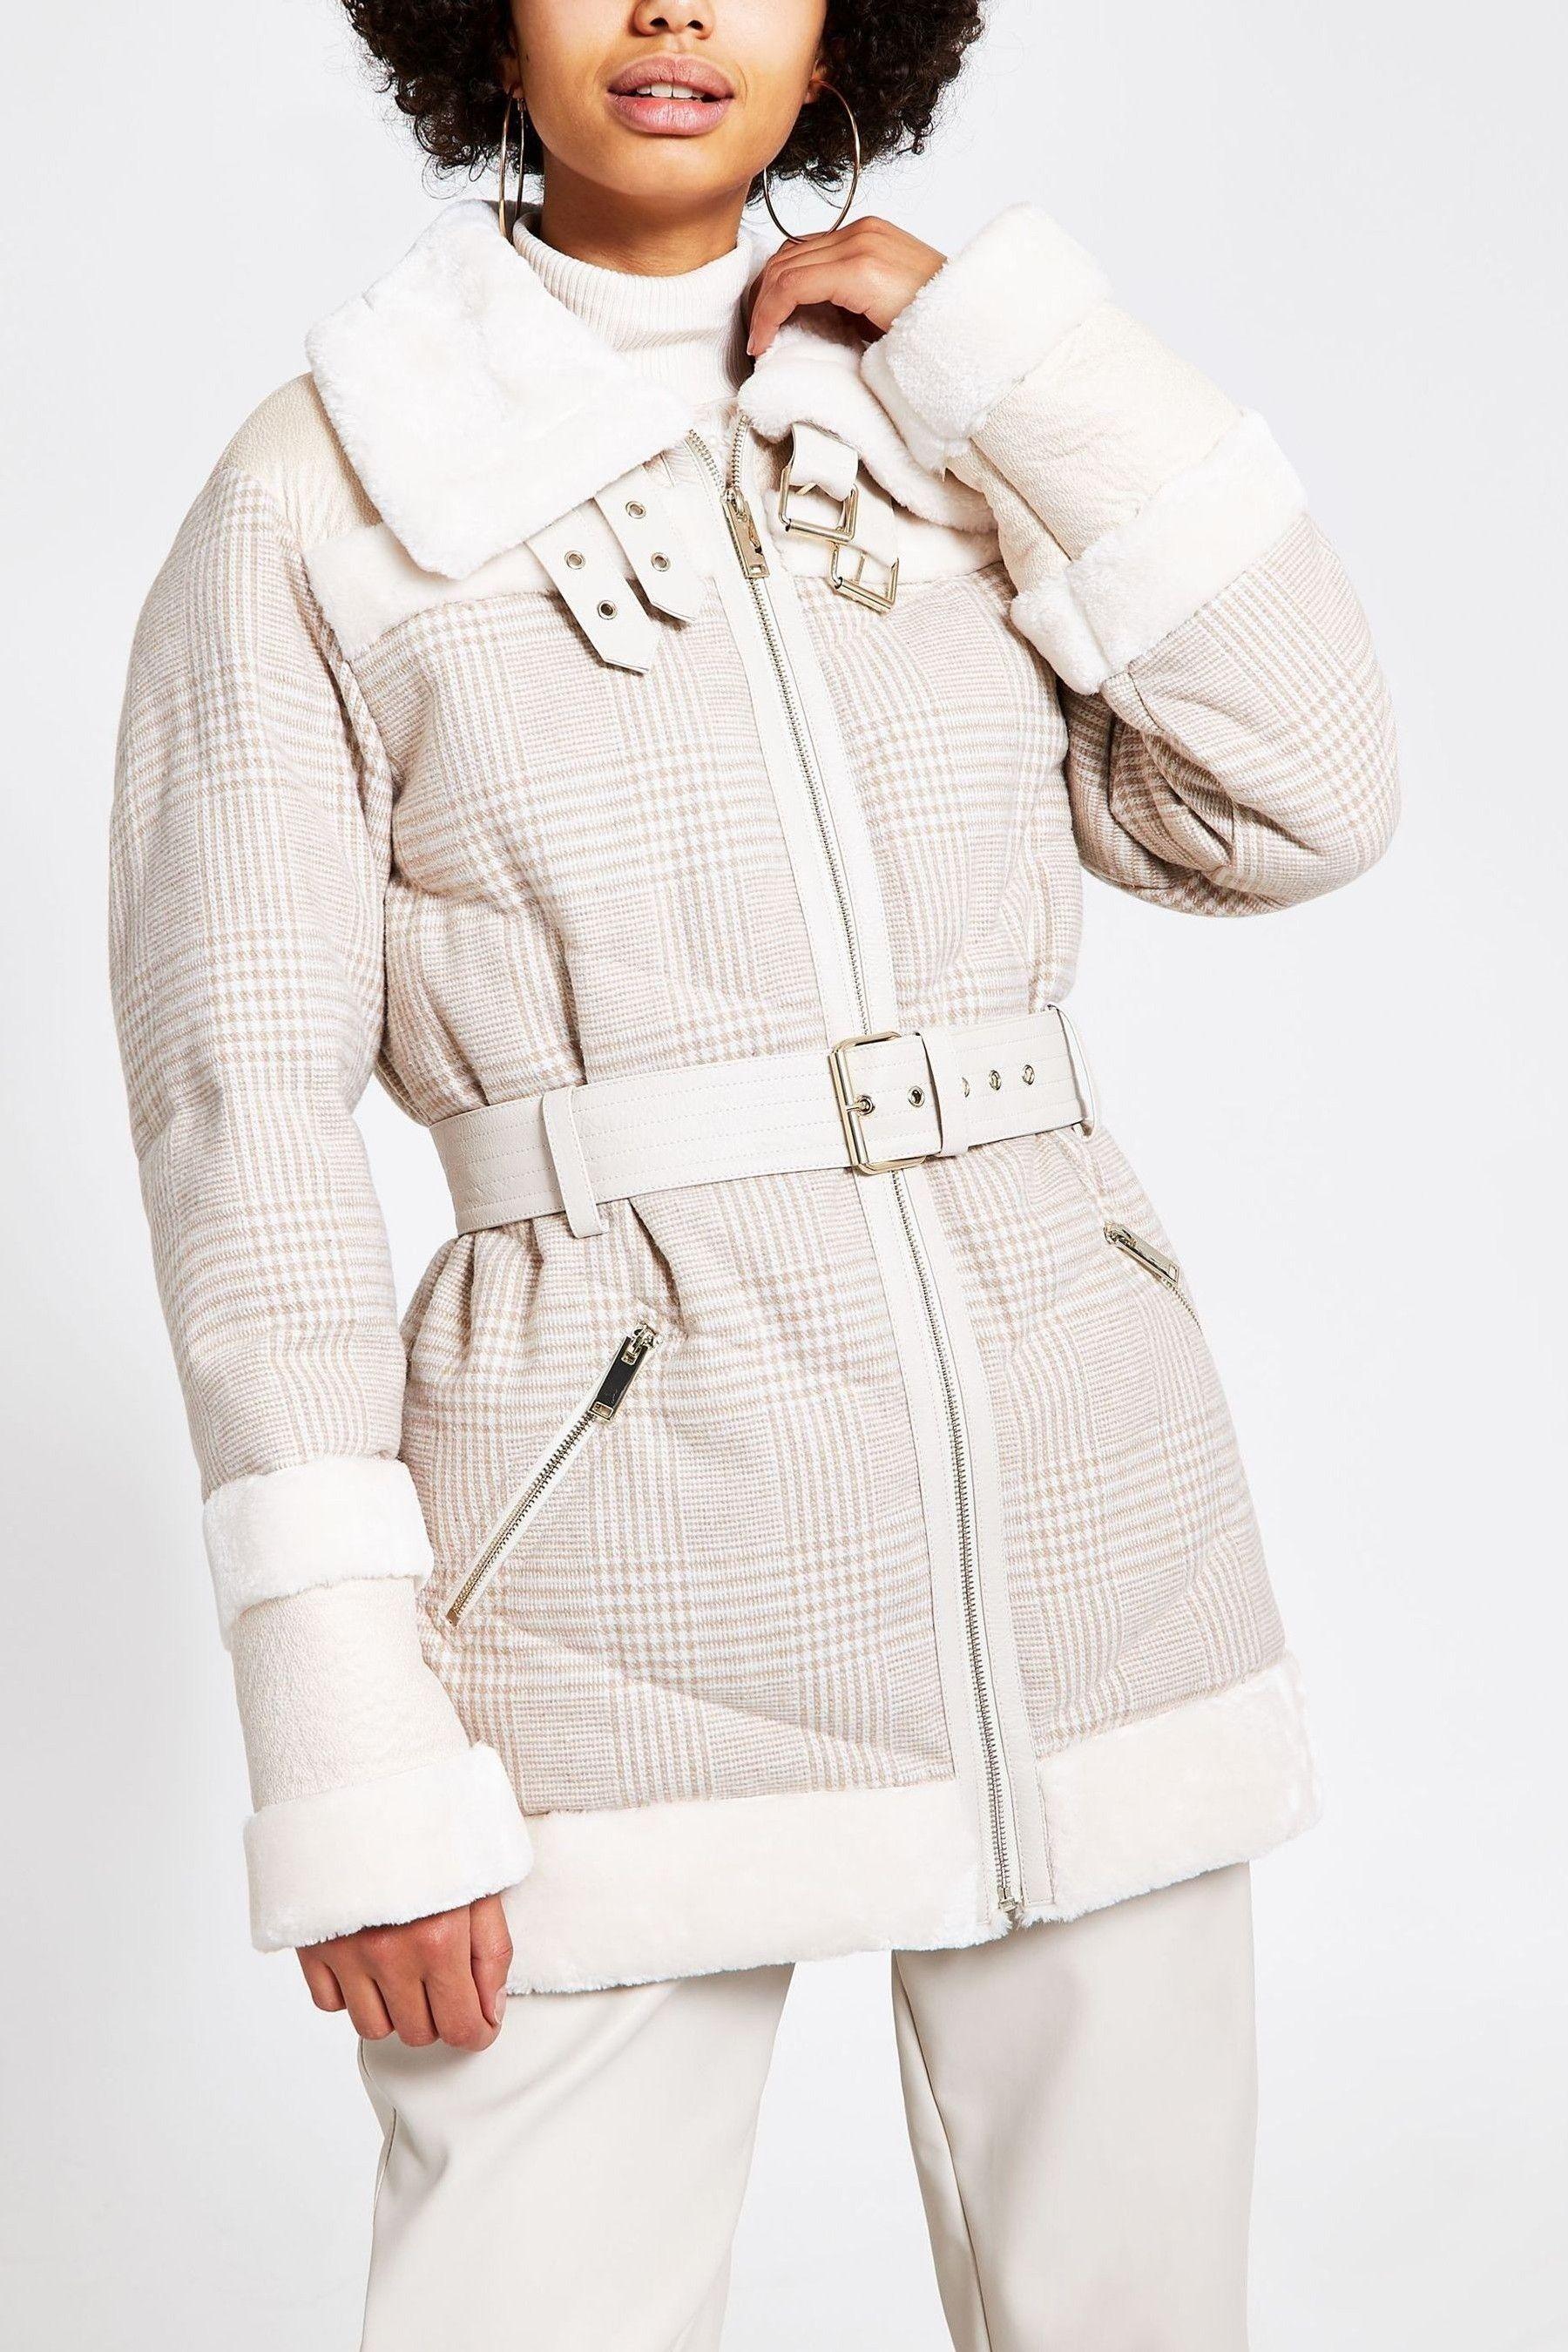 River Island Cream Woven Check Karina Hybrid Jacket in ...